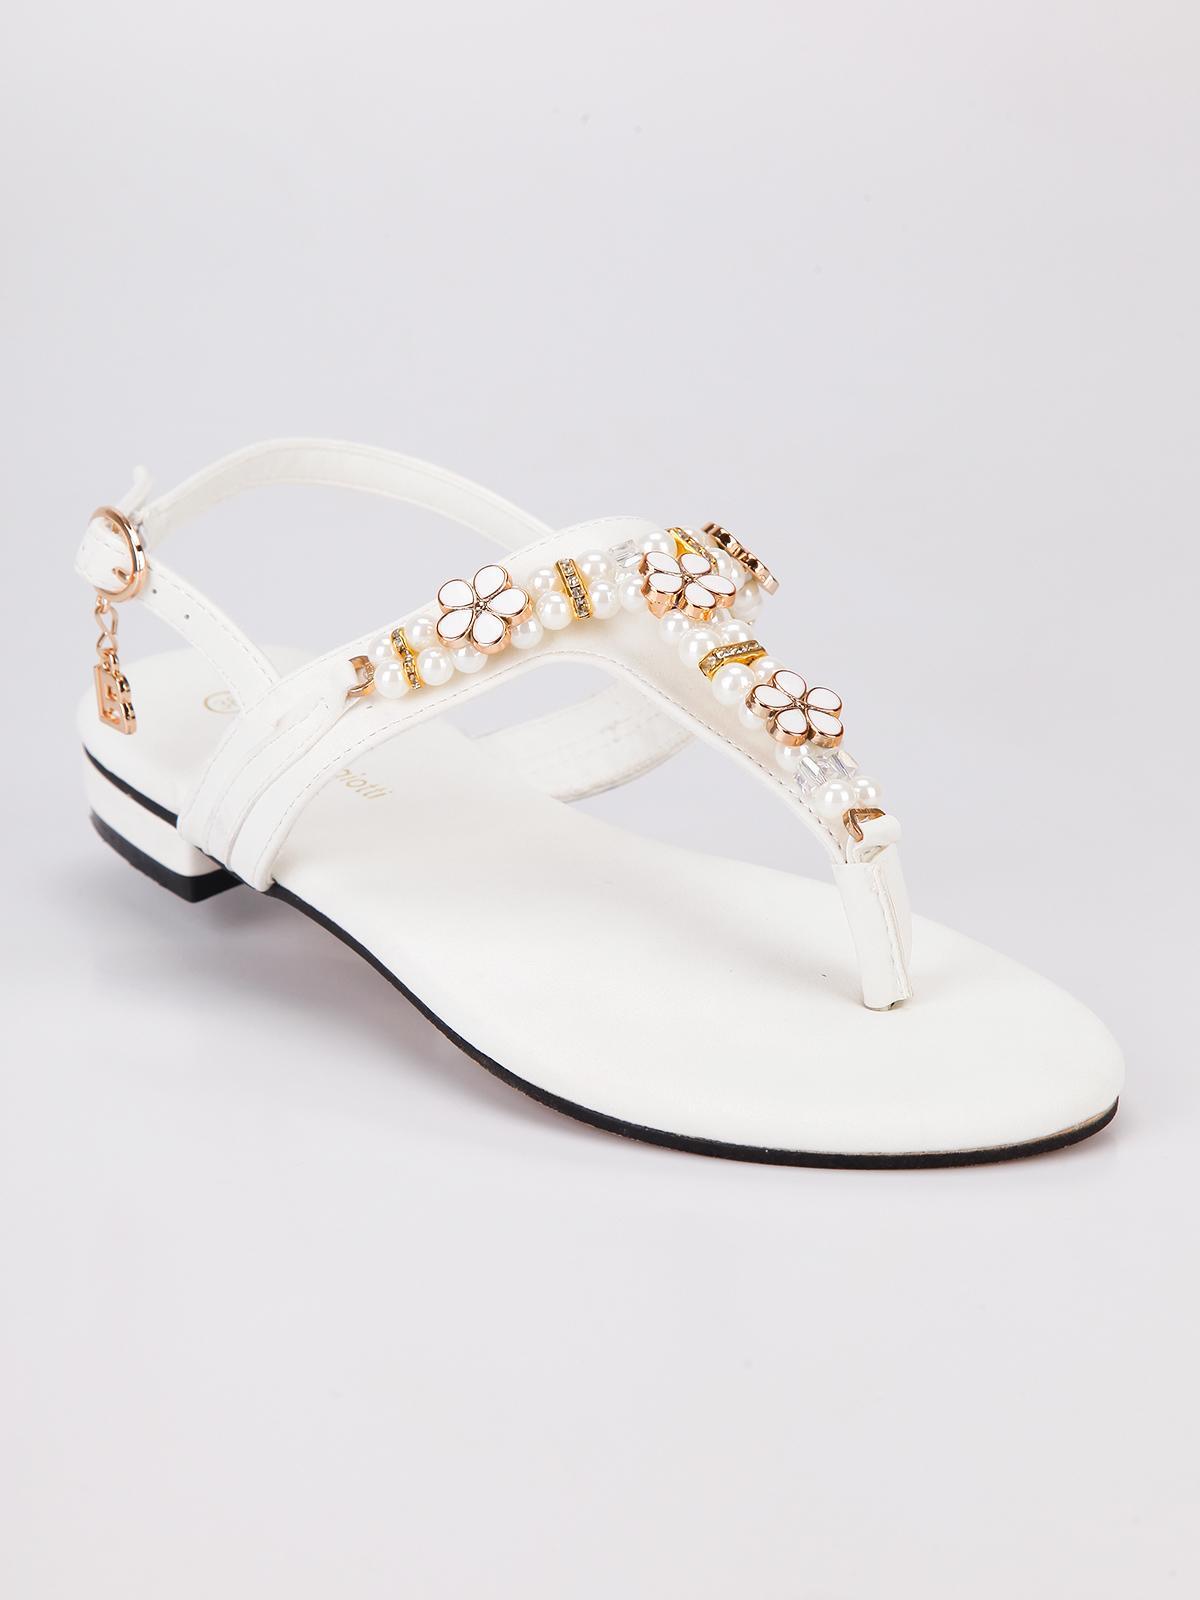 8d6bb2b6df Sandali infradito bianchi con perle laura biagiotti | MecShopping